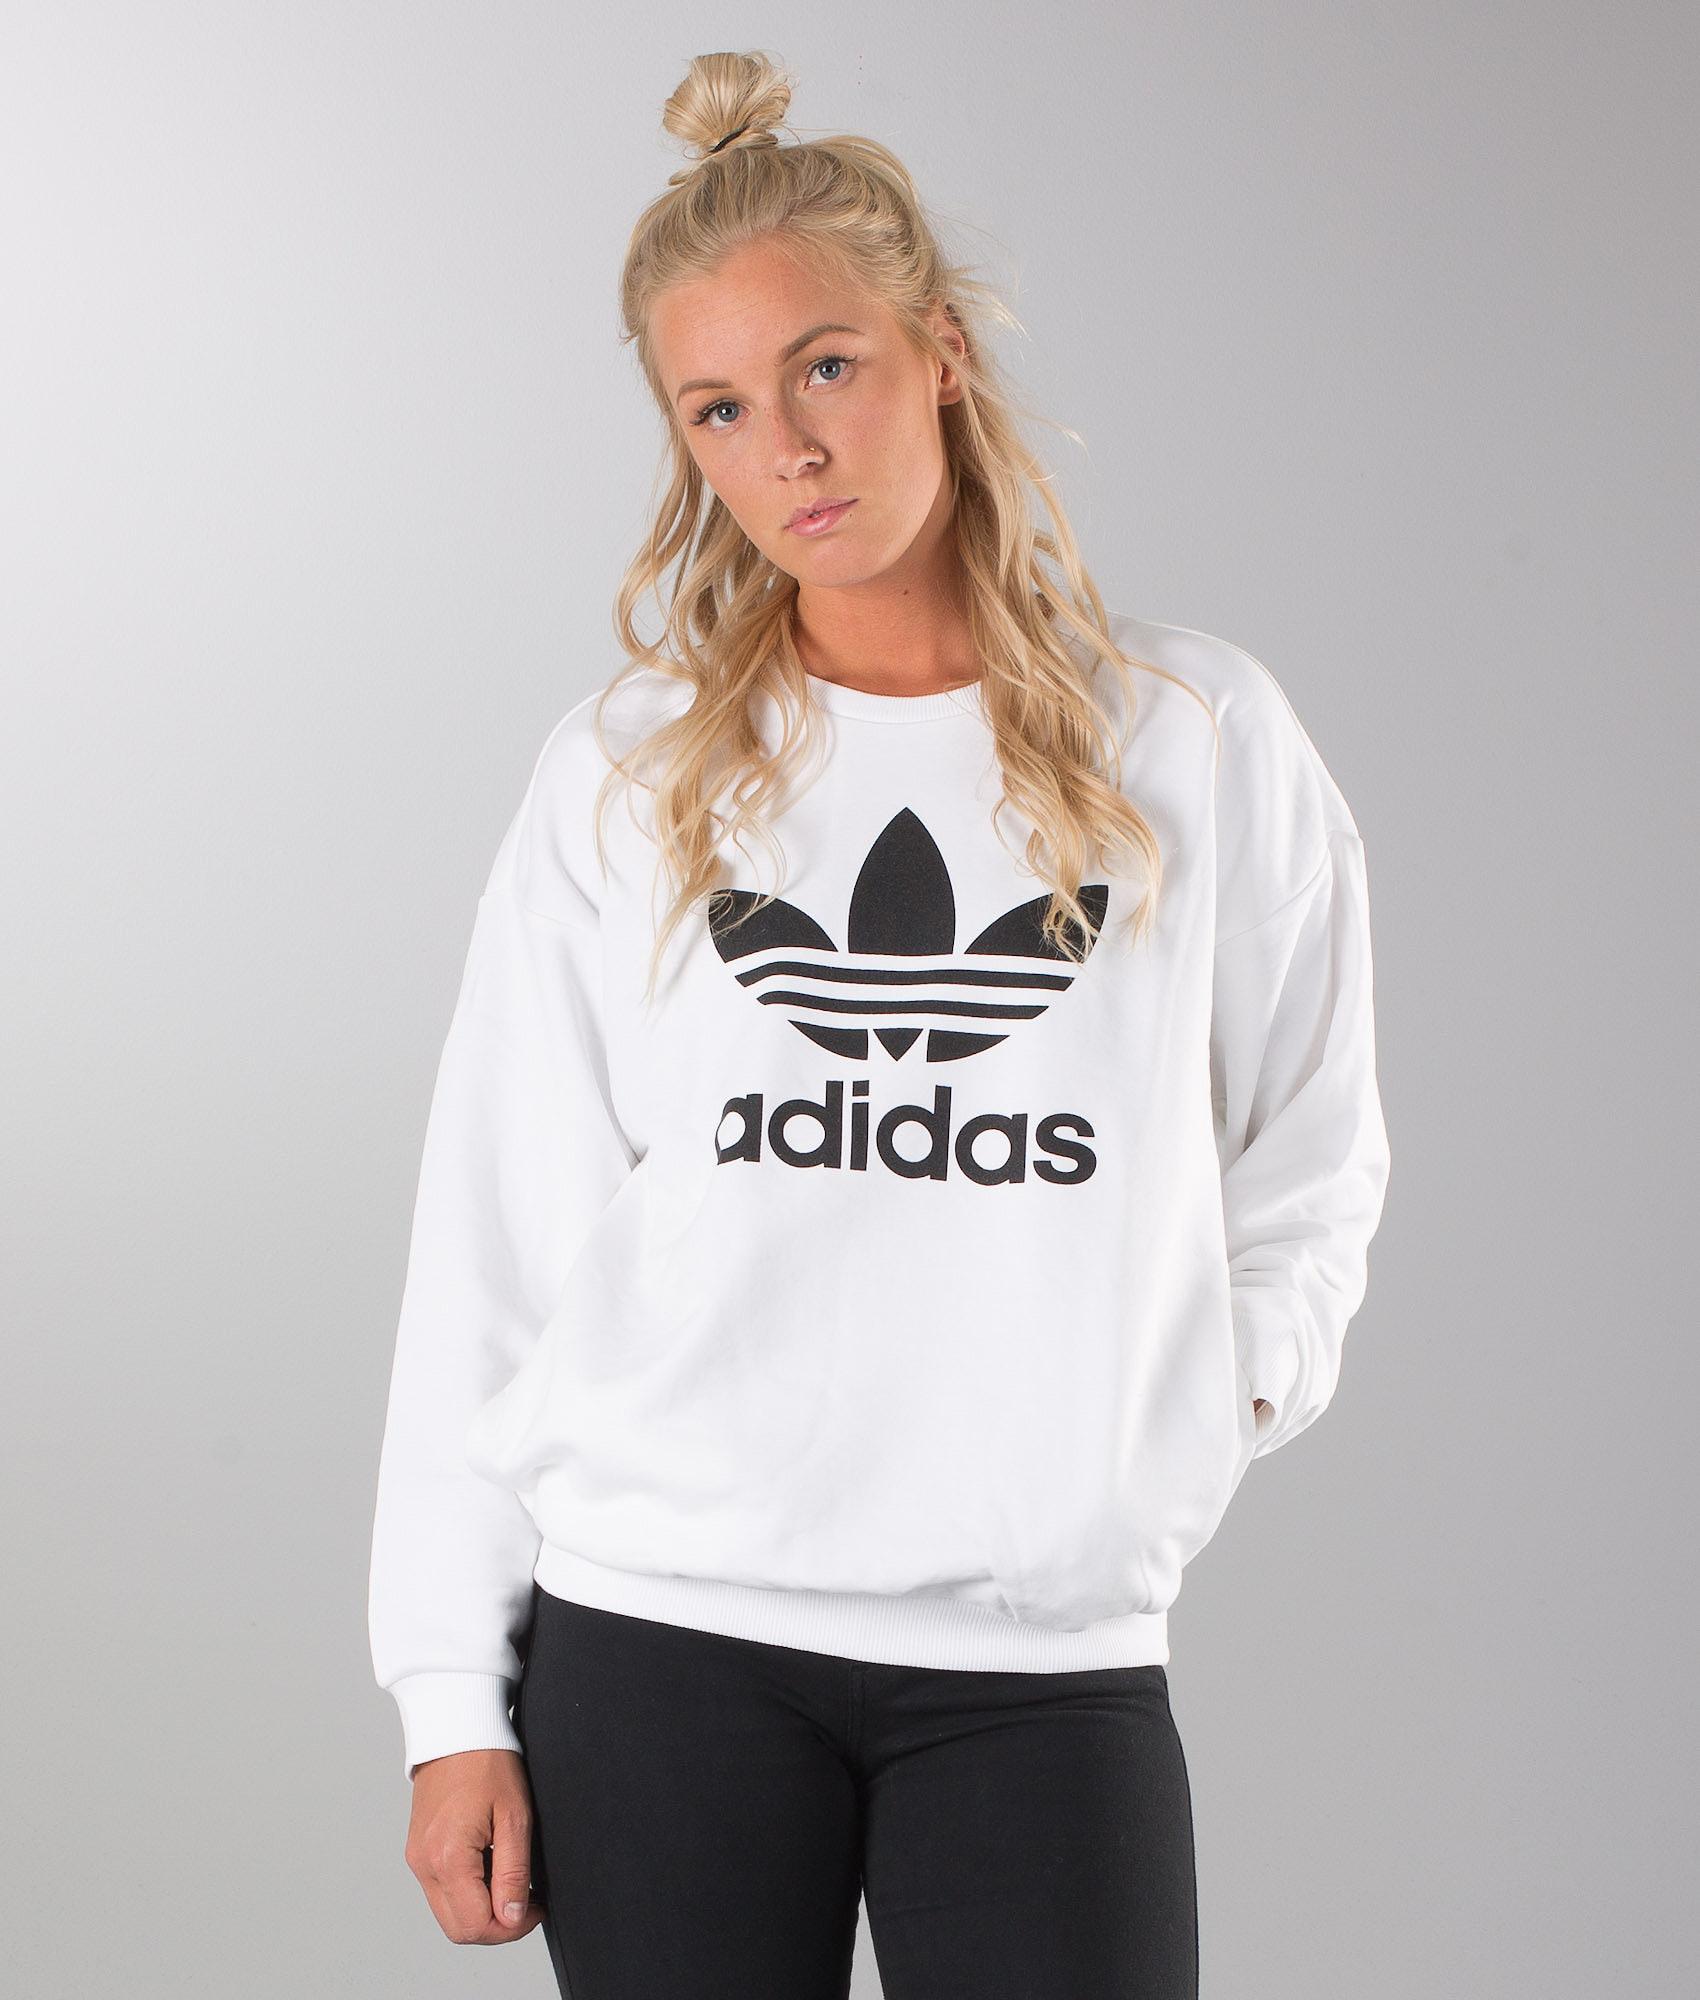 Adidas Originals Trefoil Sweat Pitkähihainen White - Ridestore.fi 9bfff7d9be